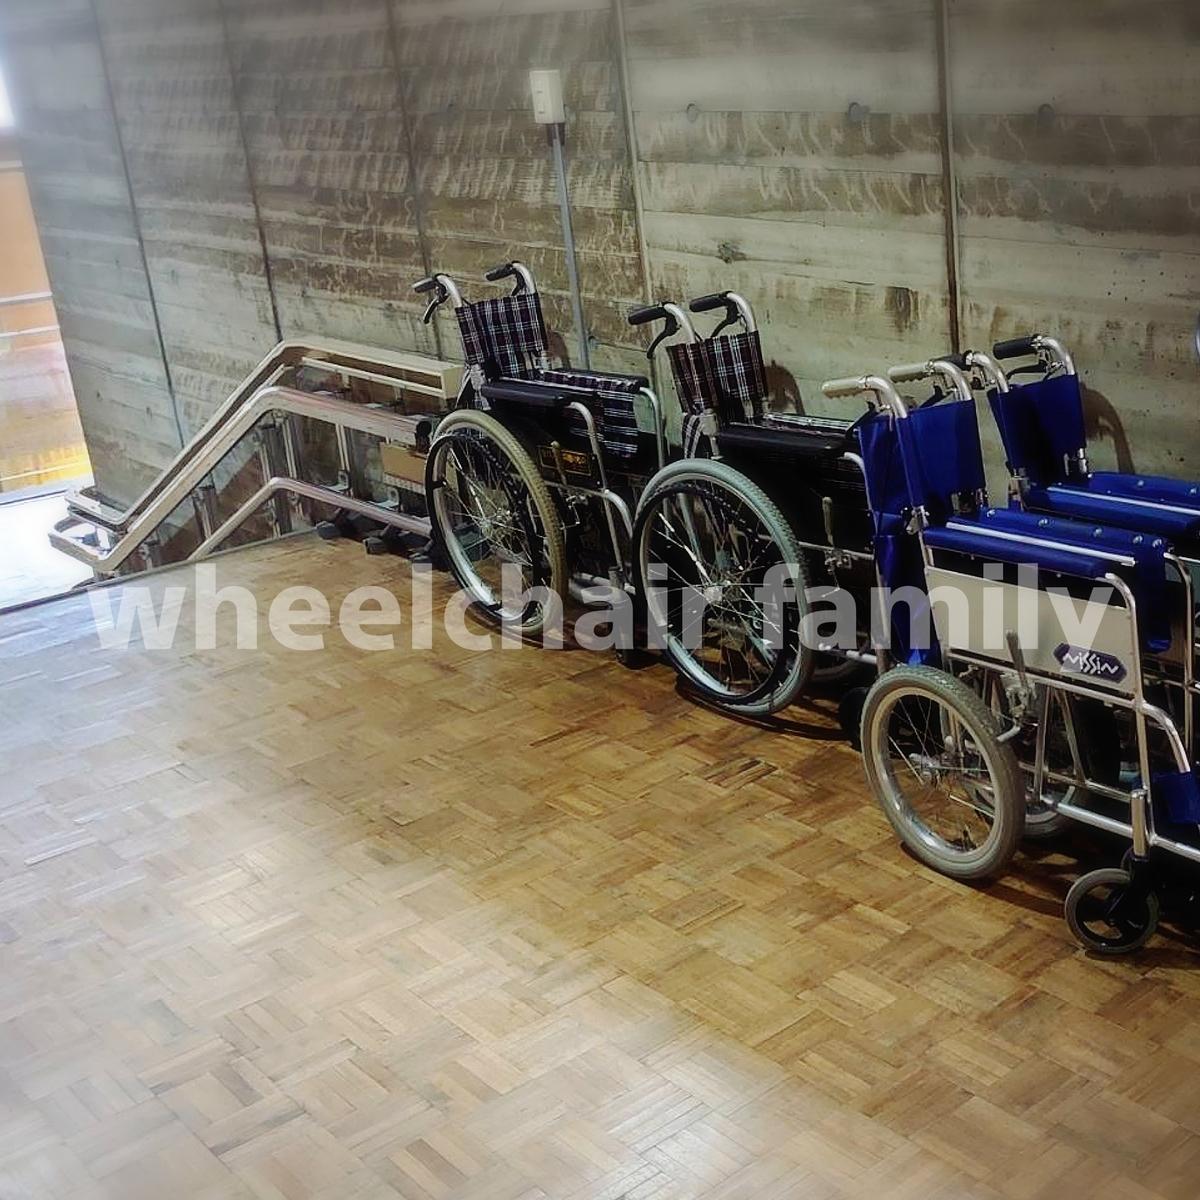 f:id:WheelchairFamily:20200215202038j:plain